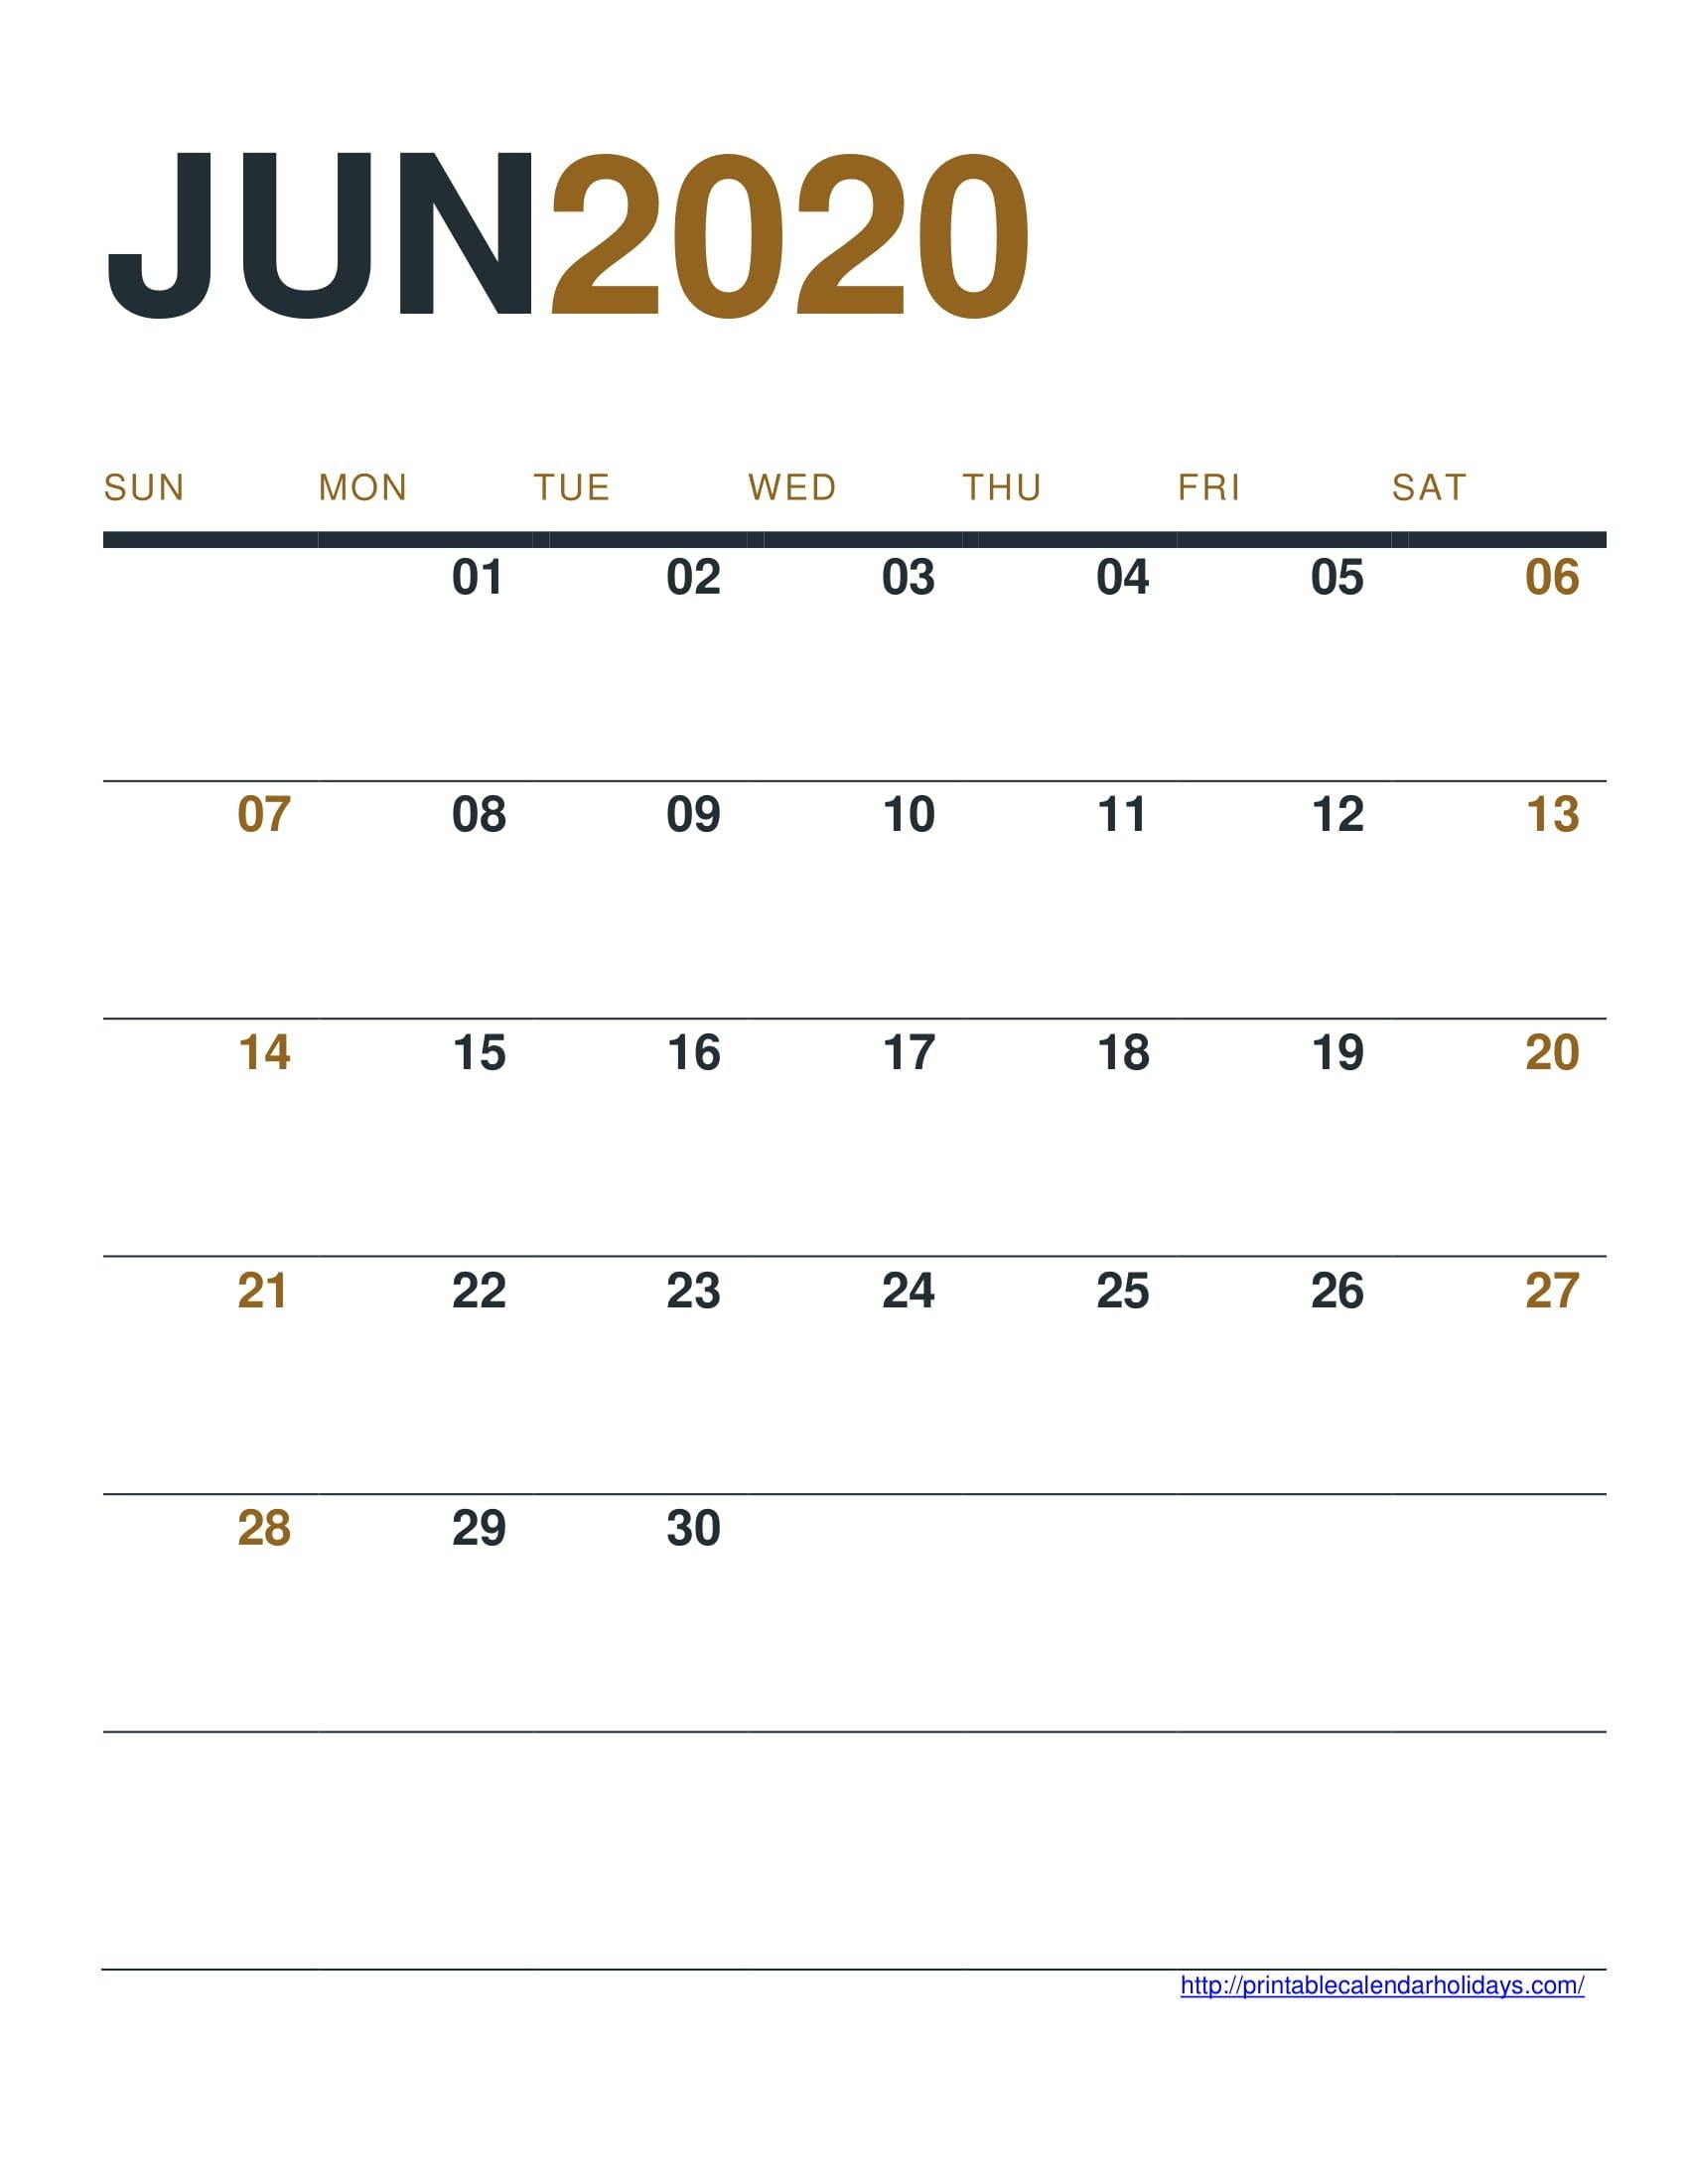 Jun 2020 Calendar Printable Free - Printable Calendar